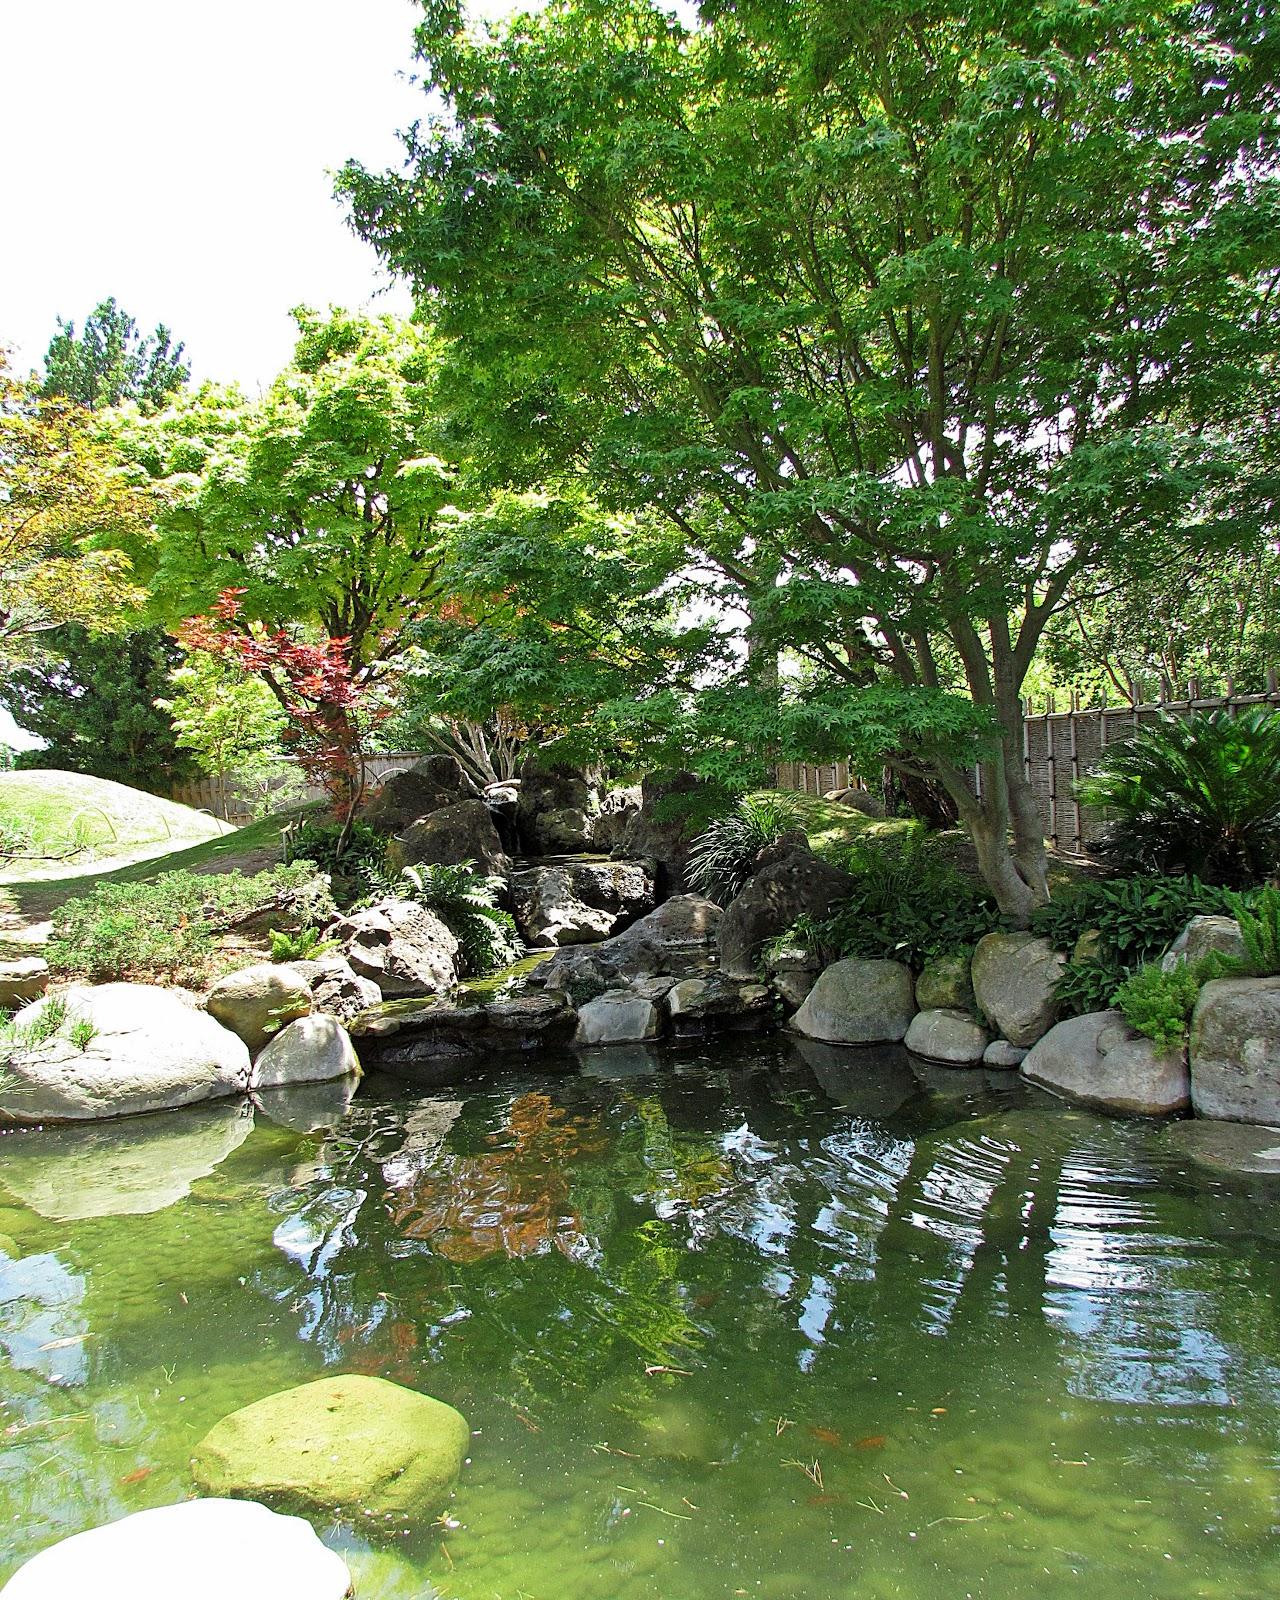 Patchwork Garden: San Antonio Botanical Gardens